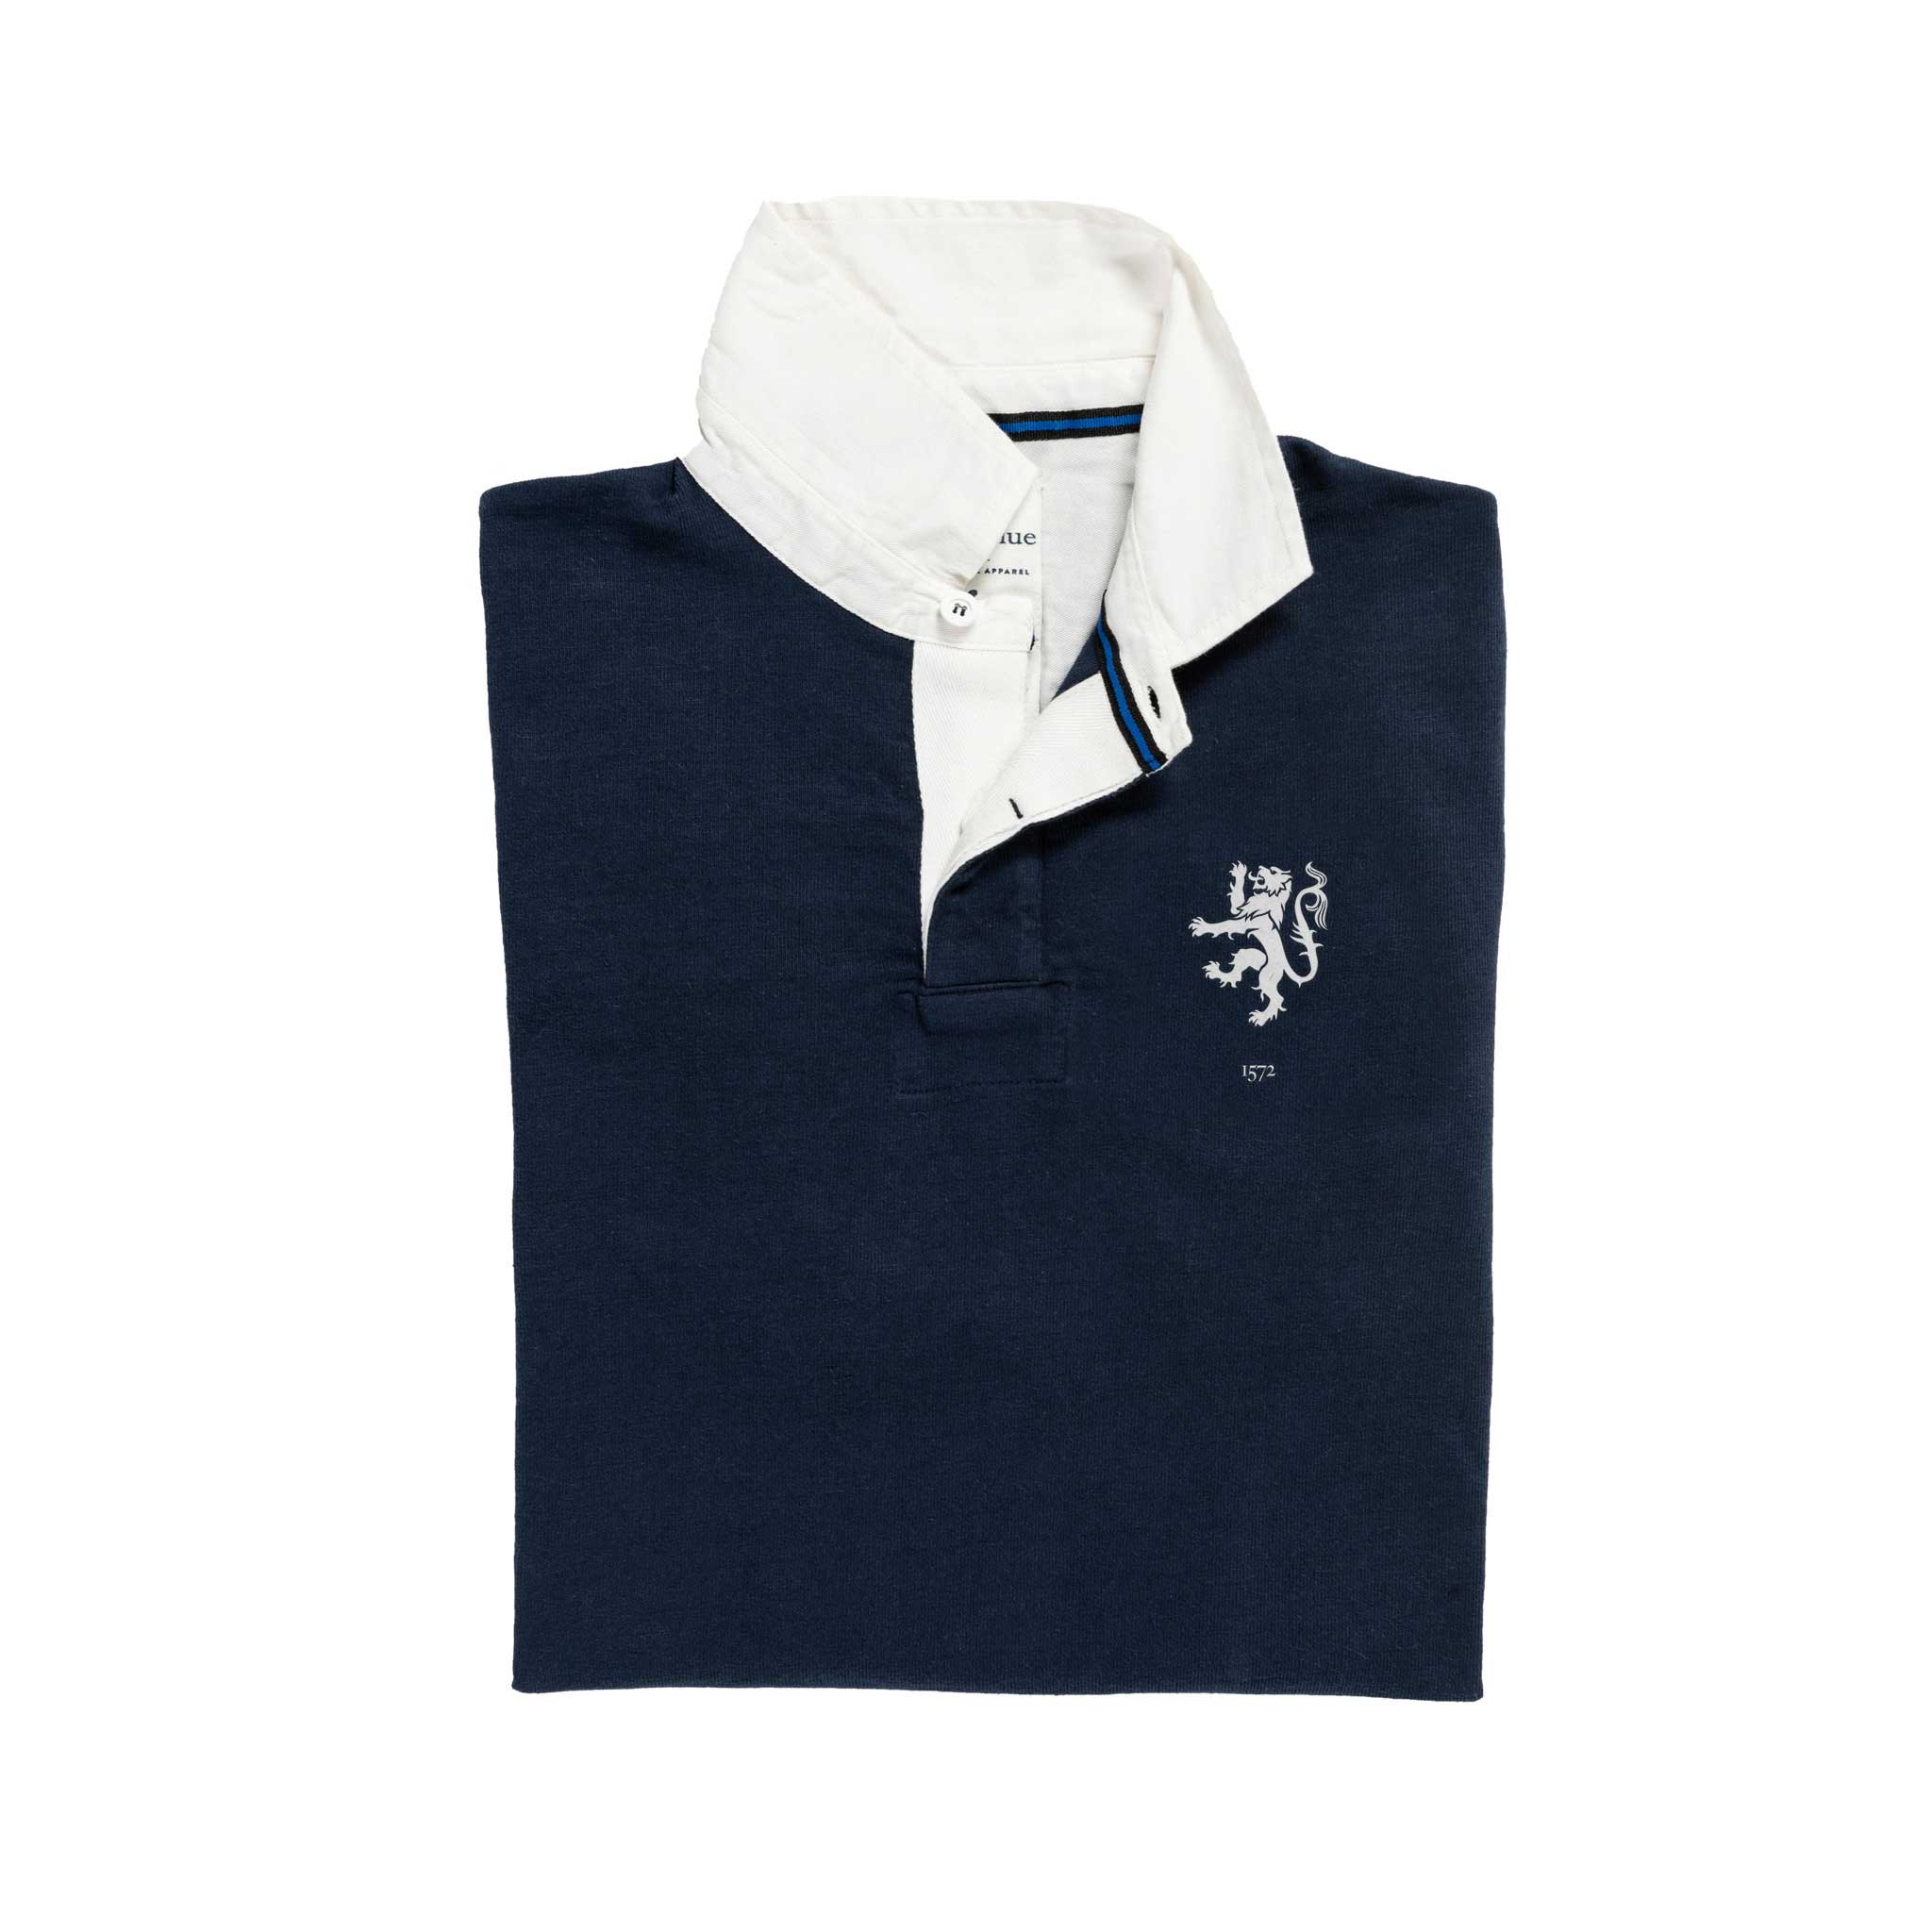 Harrow 1572 Rugby Shirt_Folded